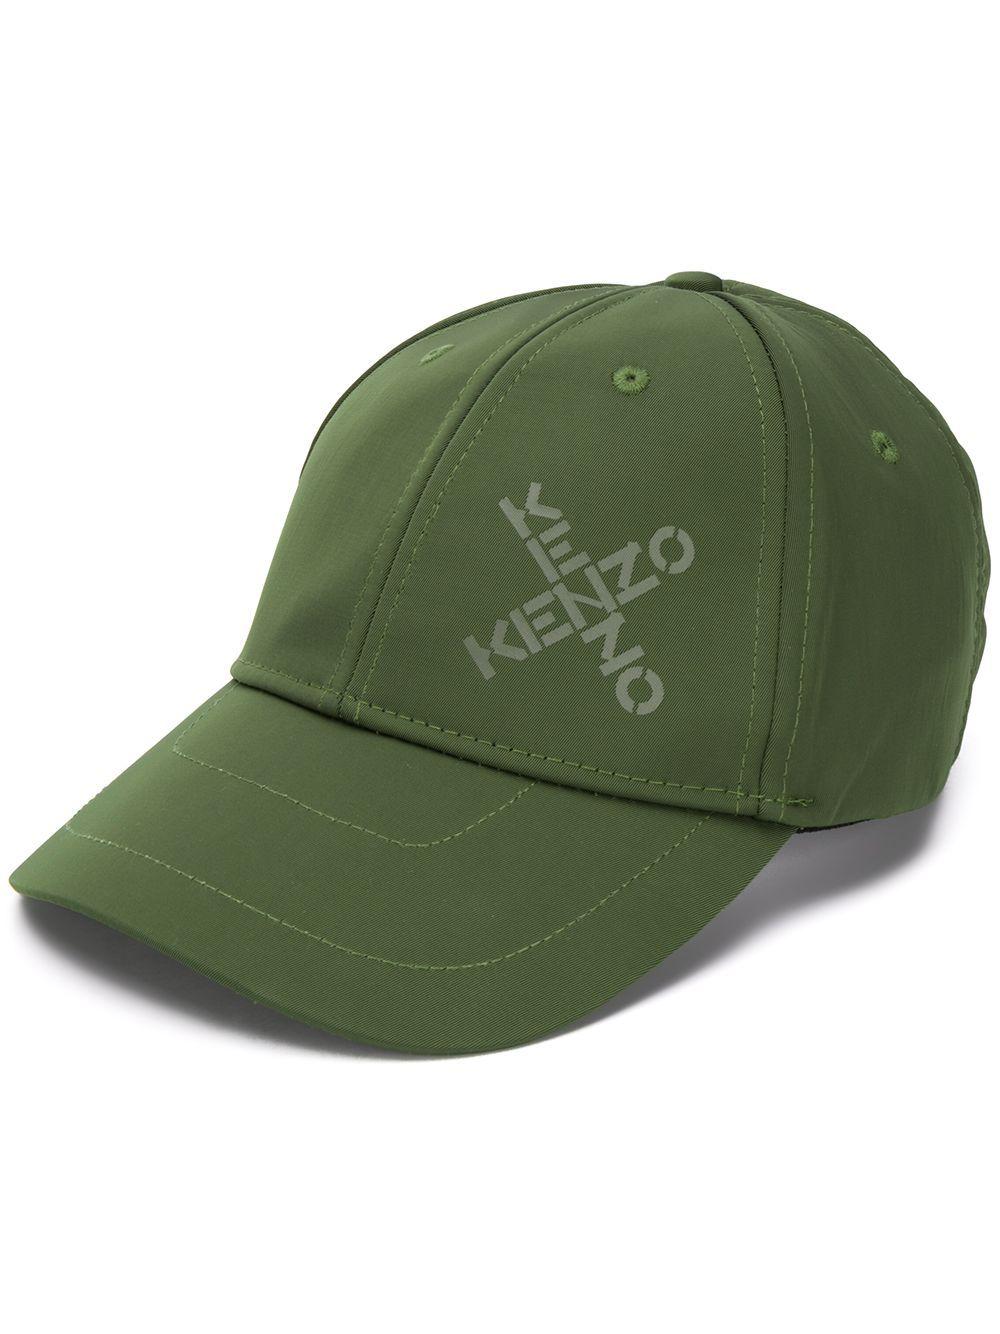 Kenzo Men's Green Polyester Hat